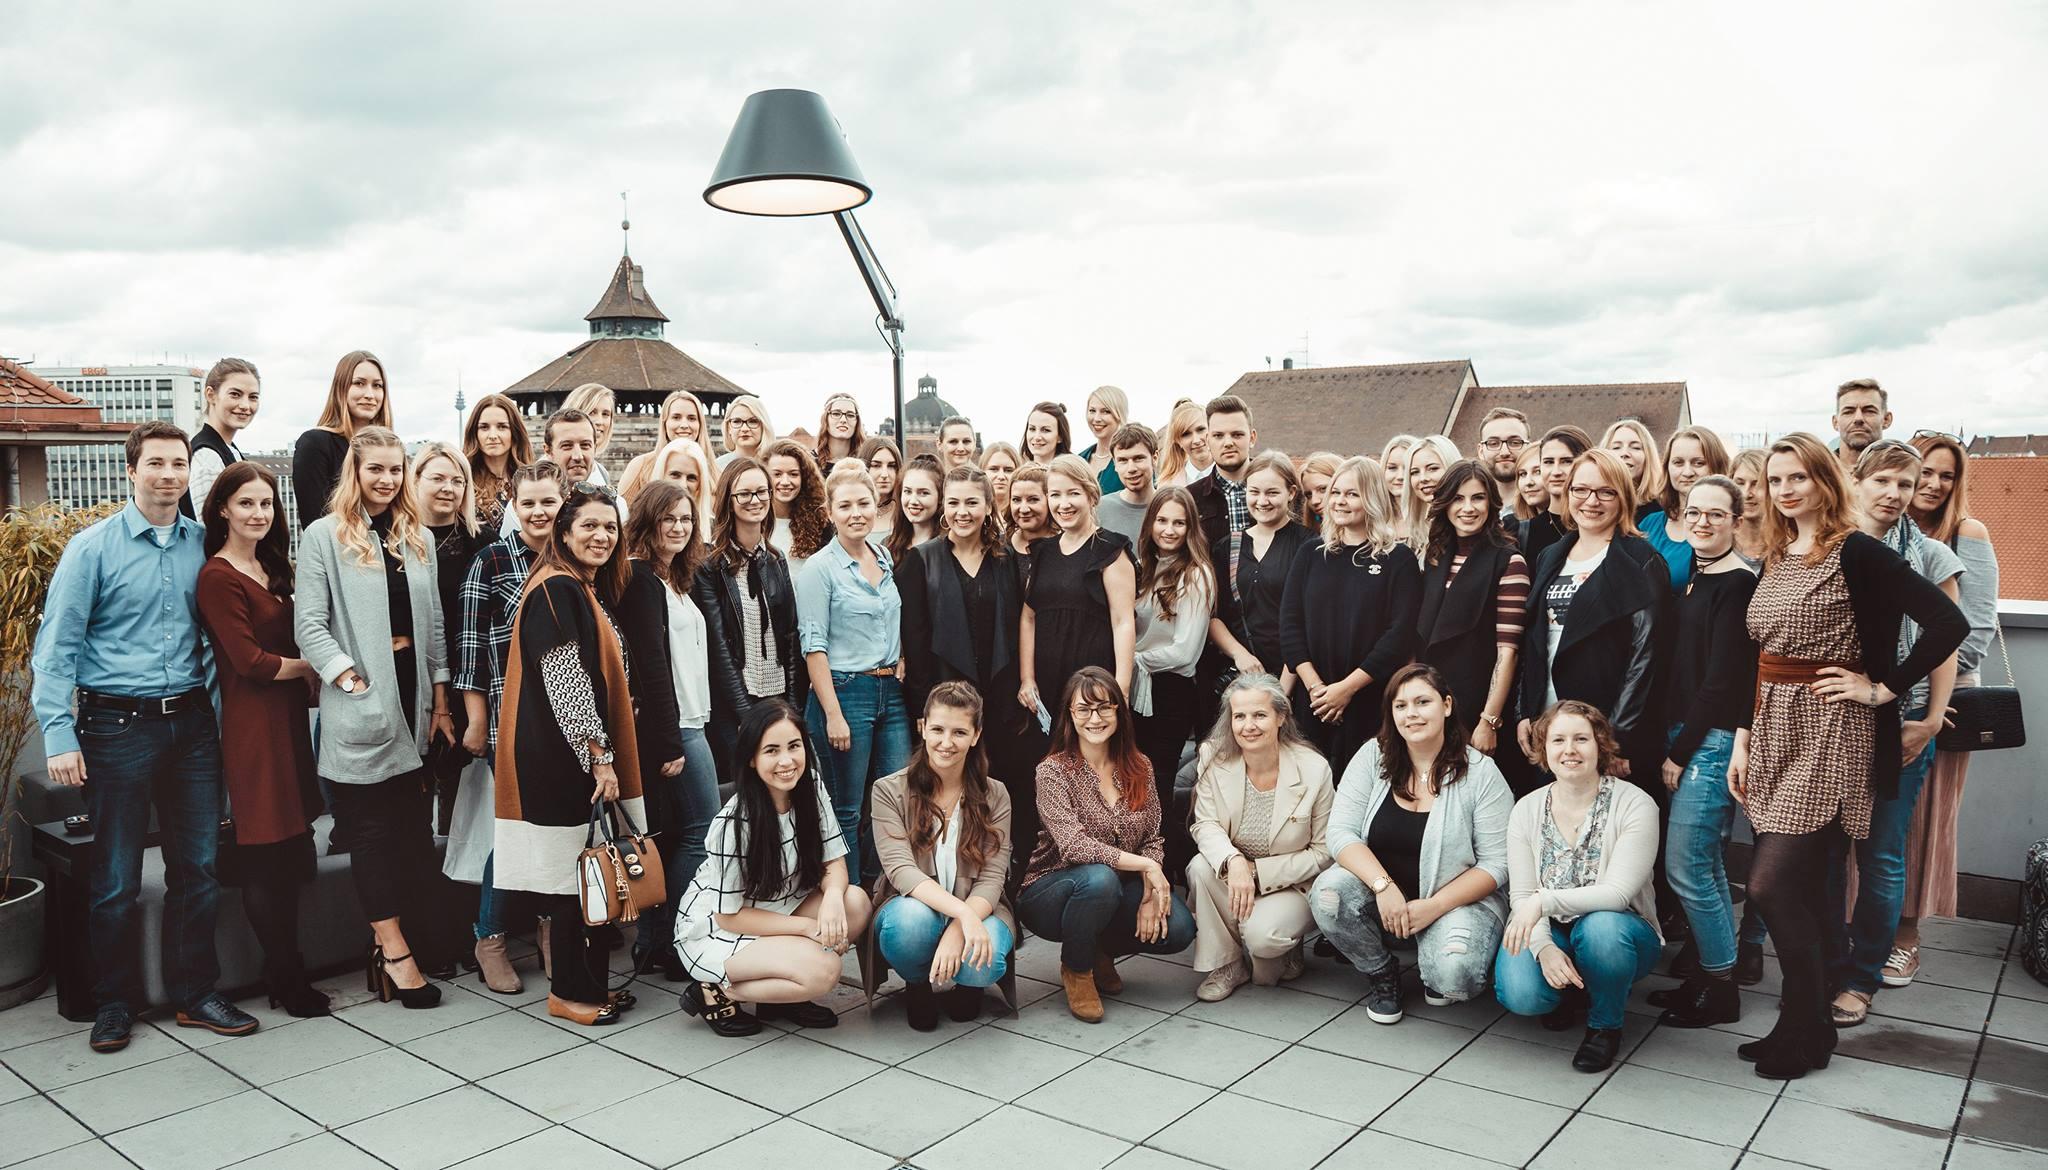 BloggerBureau, das Bloggerevent aus Nürnberg